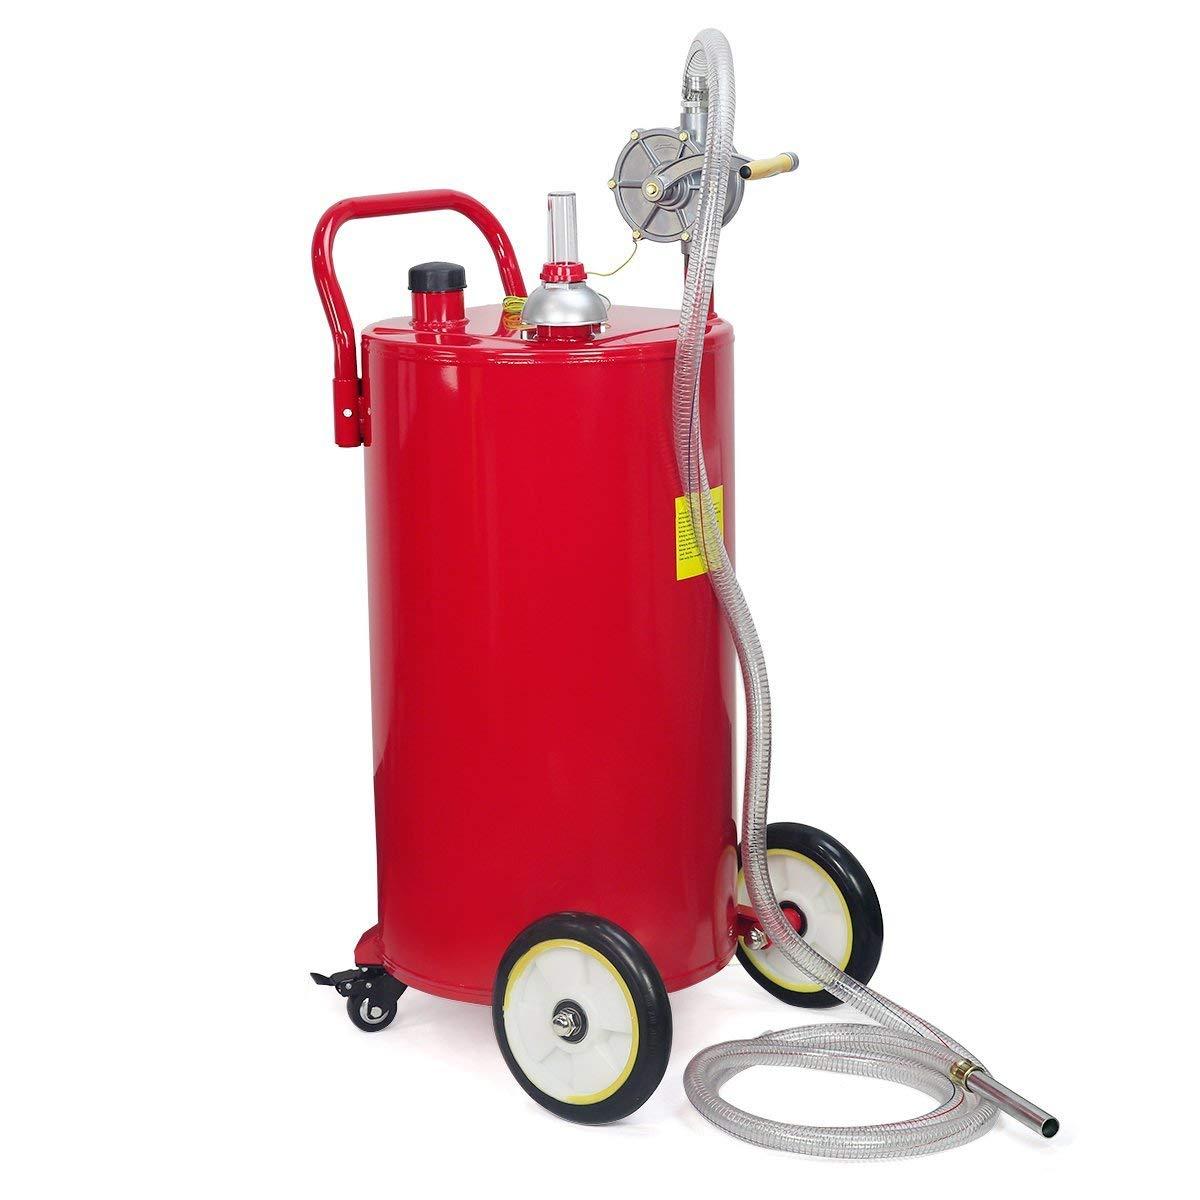 STKUSA 35-Gallon Portable Fuel Transfer Gas Can Caddy Storage Tank 35gal-Capacity Pump w/Wheel